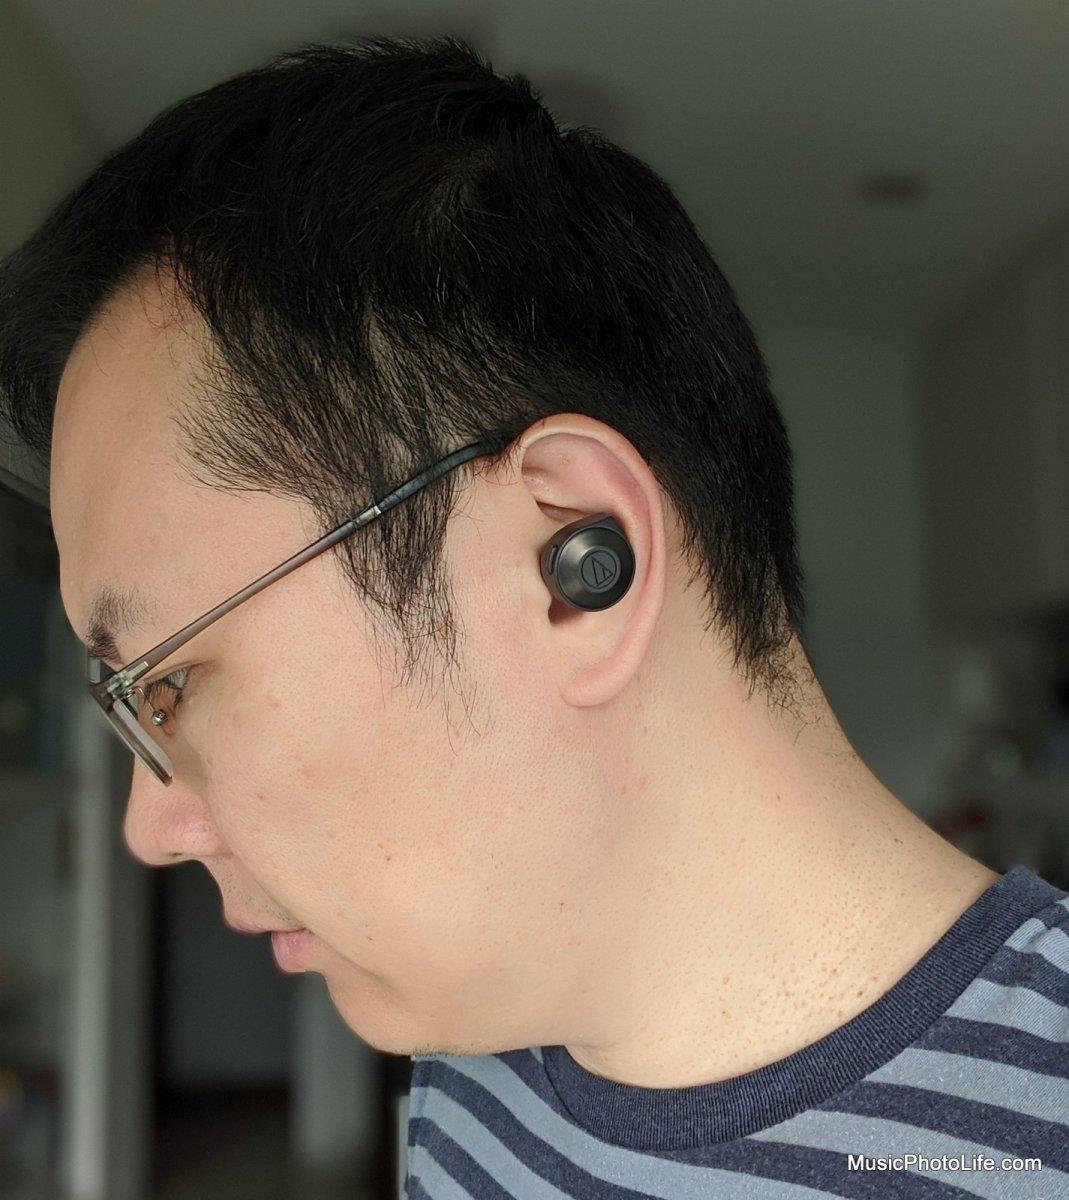 Audio-Technica ATH-CKS5TW wearing in ears